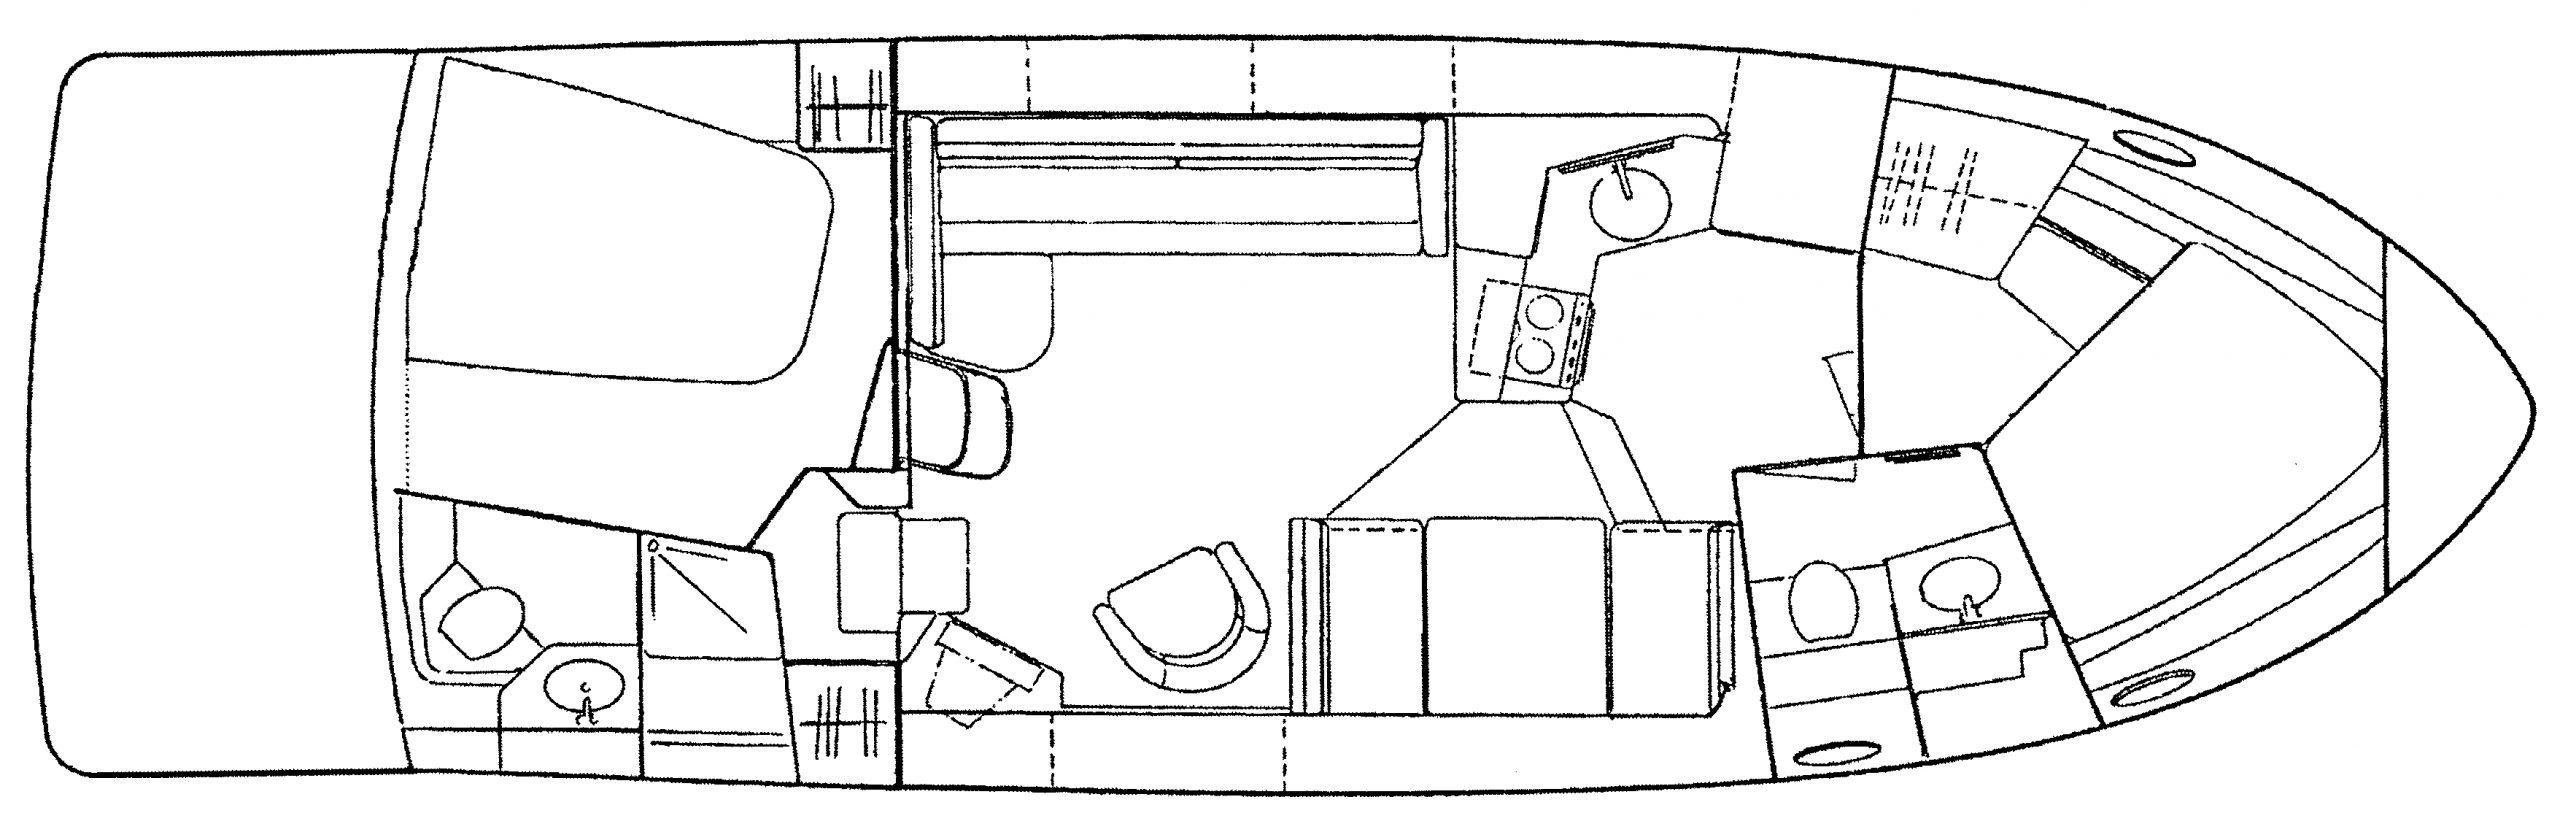 390-400-404 Cockpit Motor Yacht Floor Plan 1